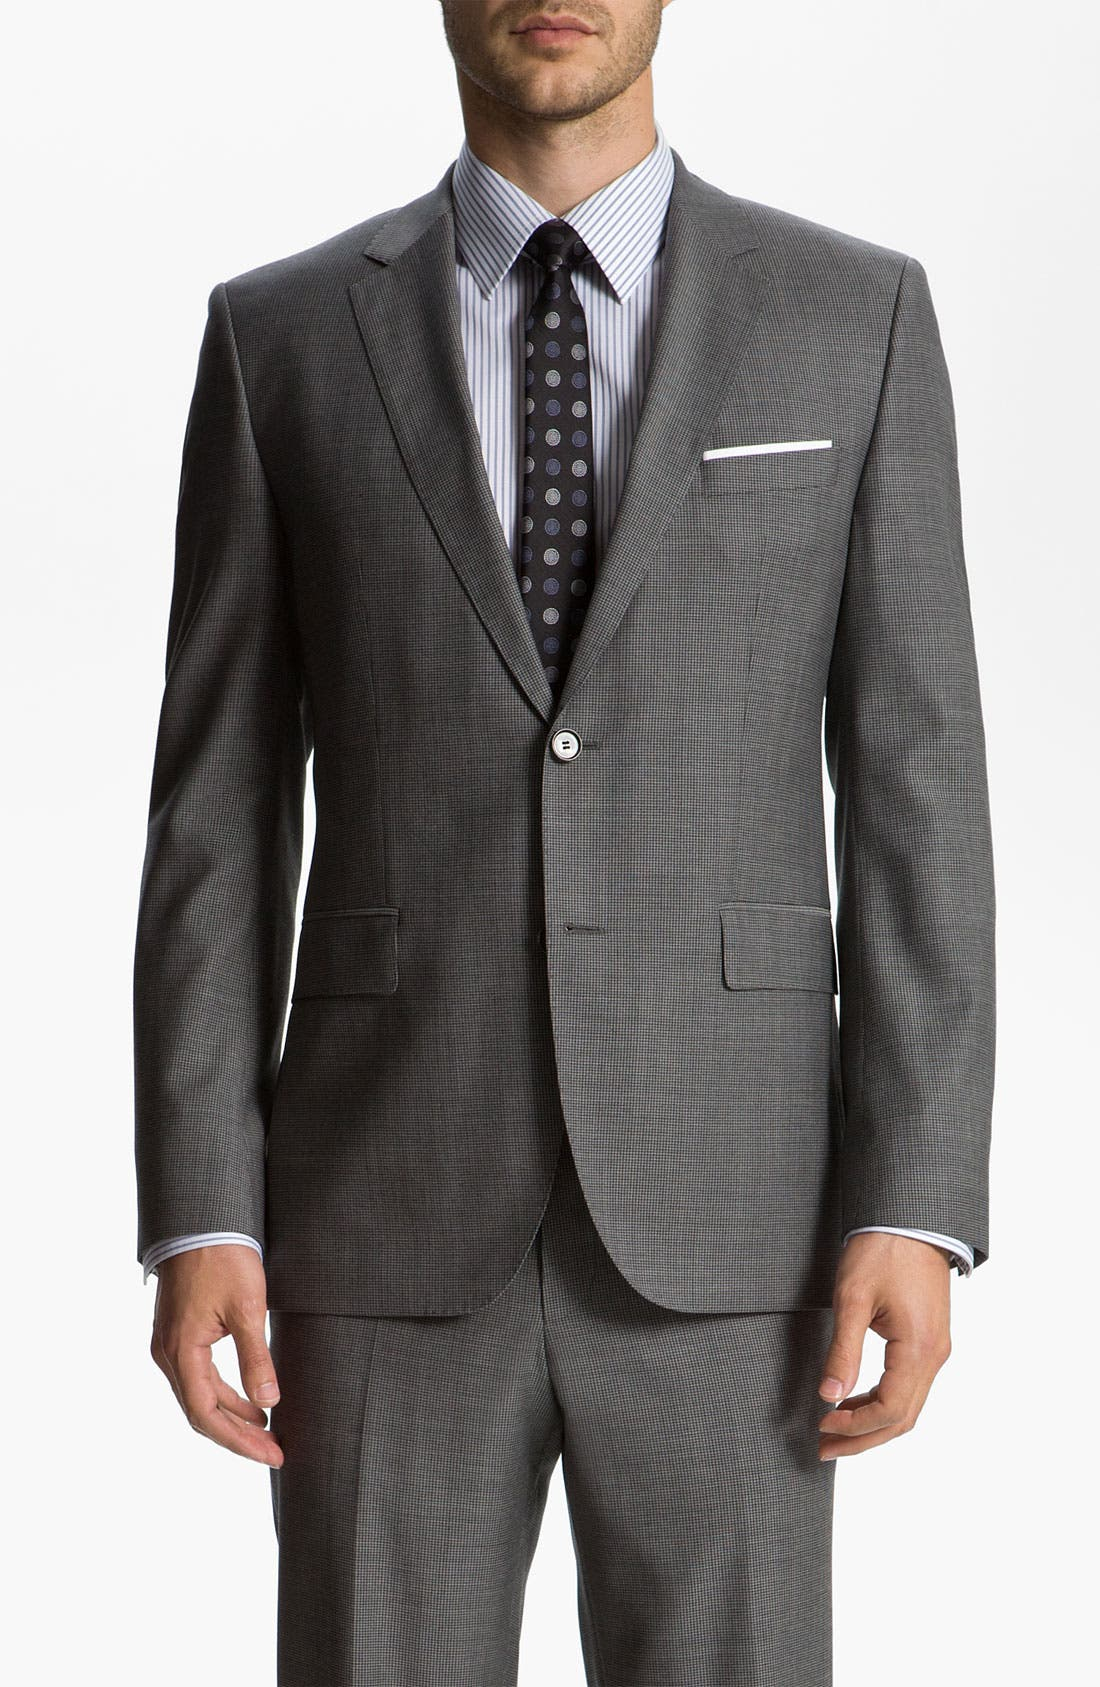 Alternate Image 1 Selected - BOSS Black 'James/Sharp' Trim Fit Neat Check Suit